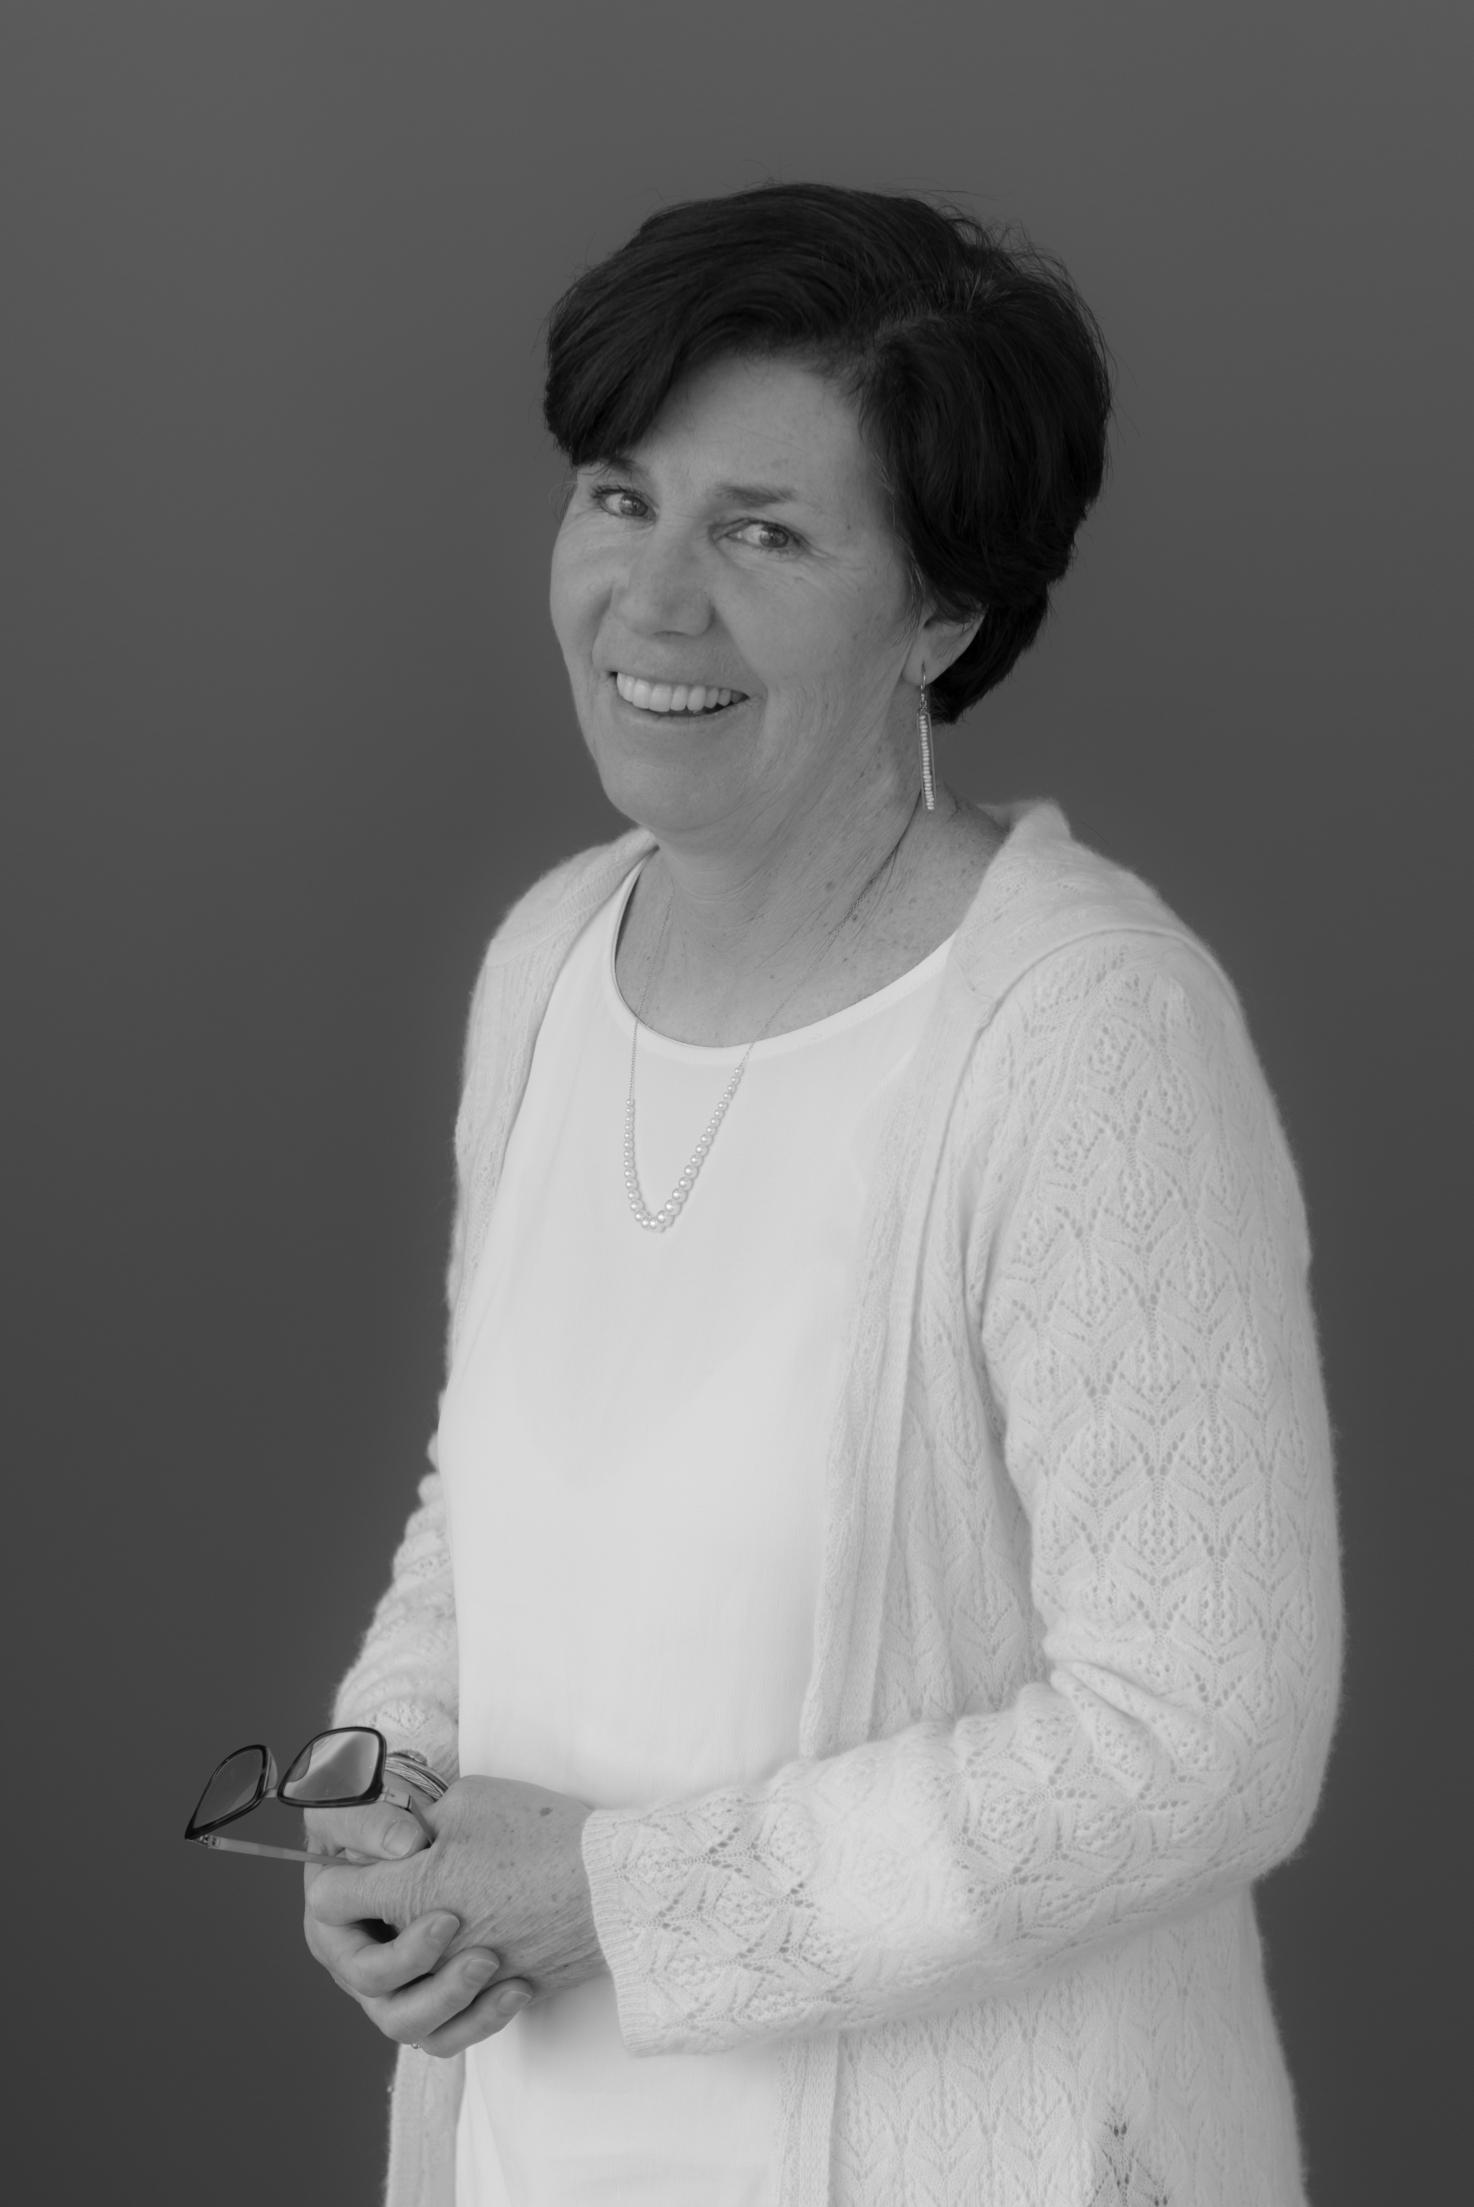 Kathy Bonnar